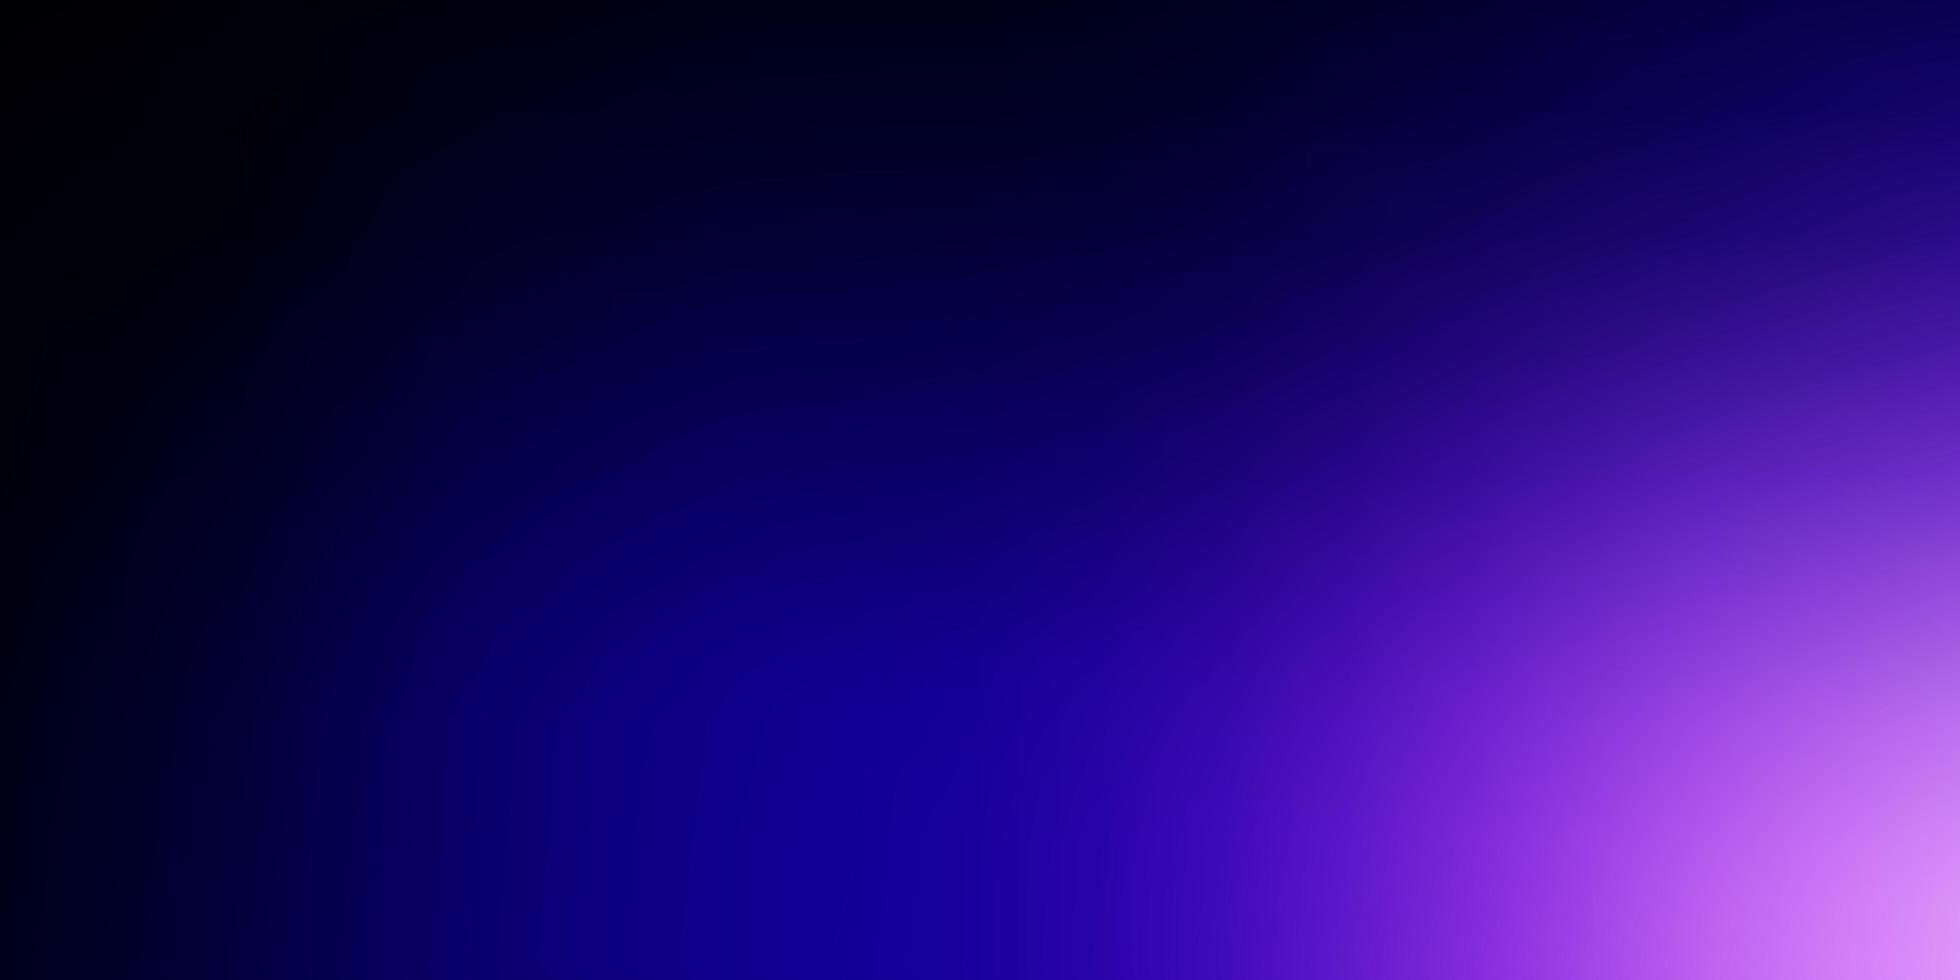 abstrakter Hintergrund des dunkelvioletten, rosa Vektors. vektor